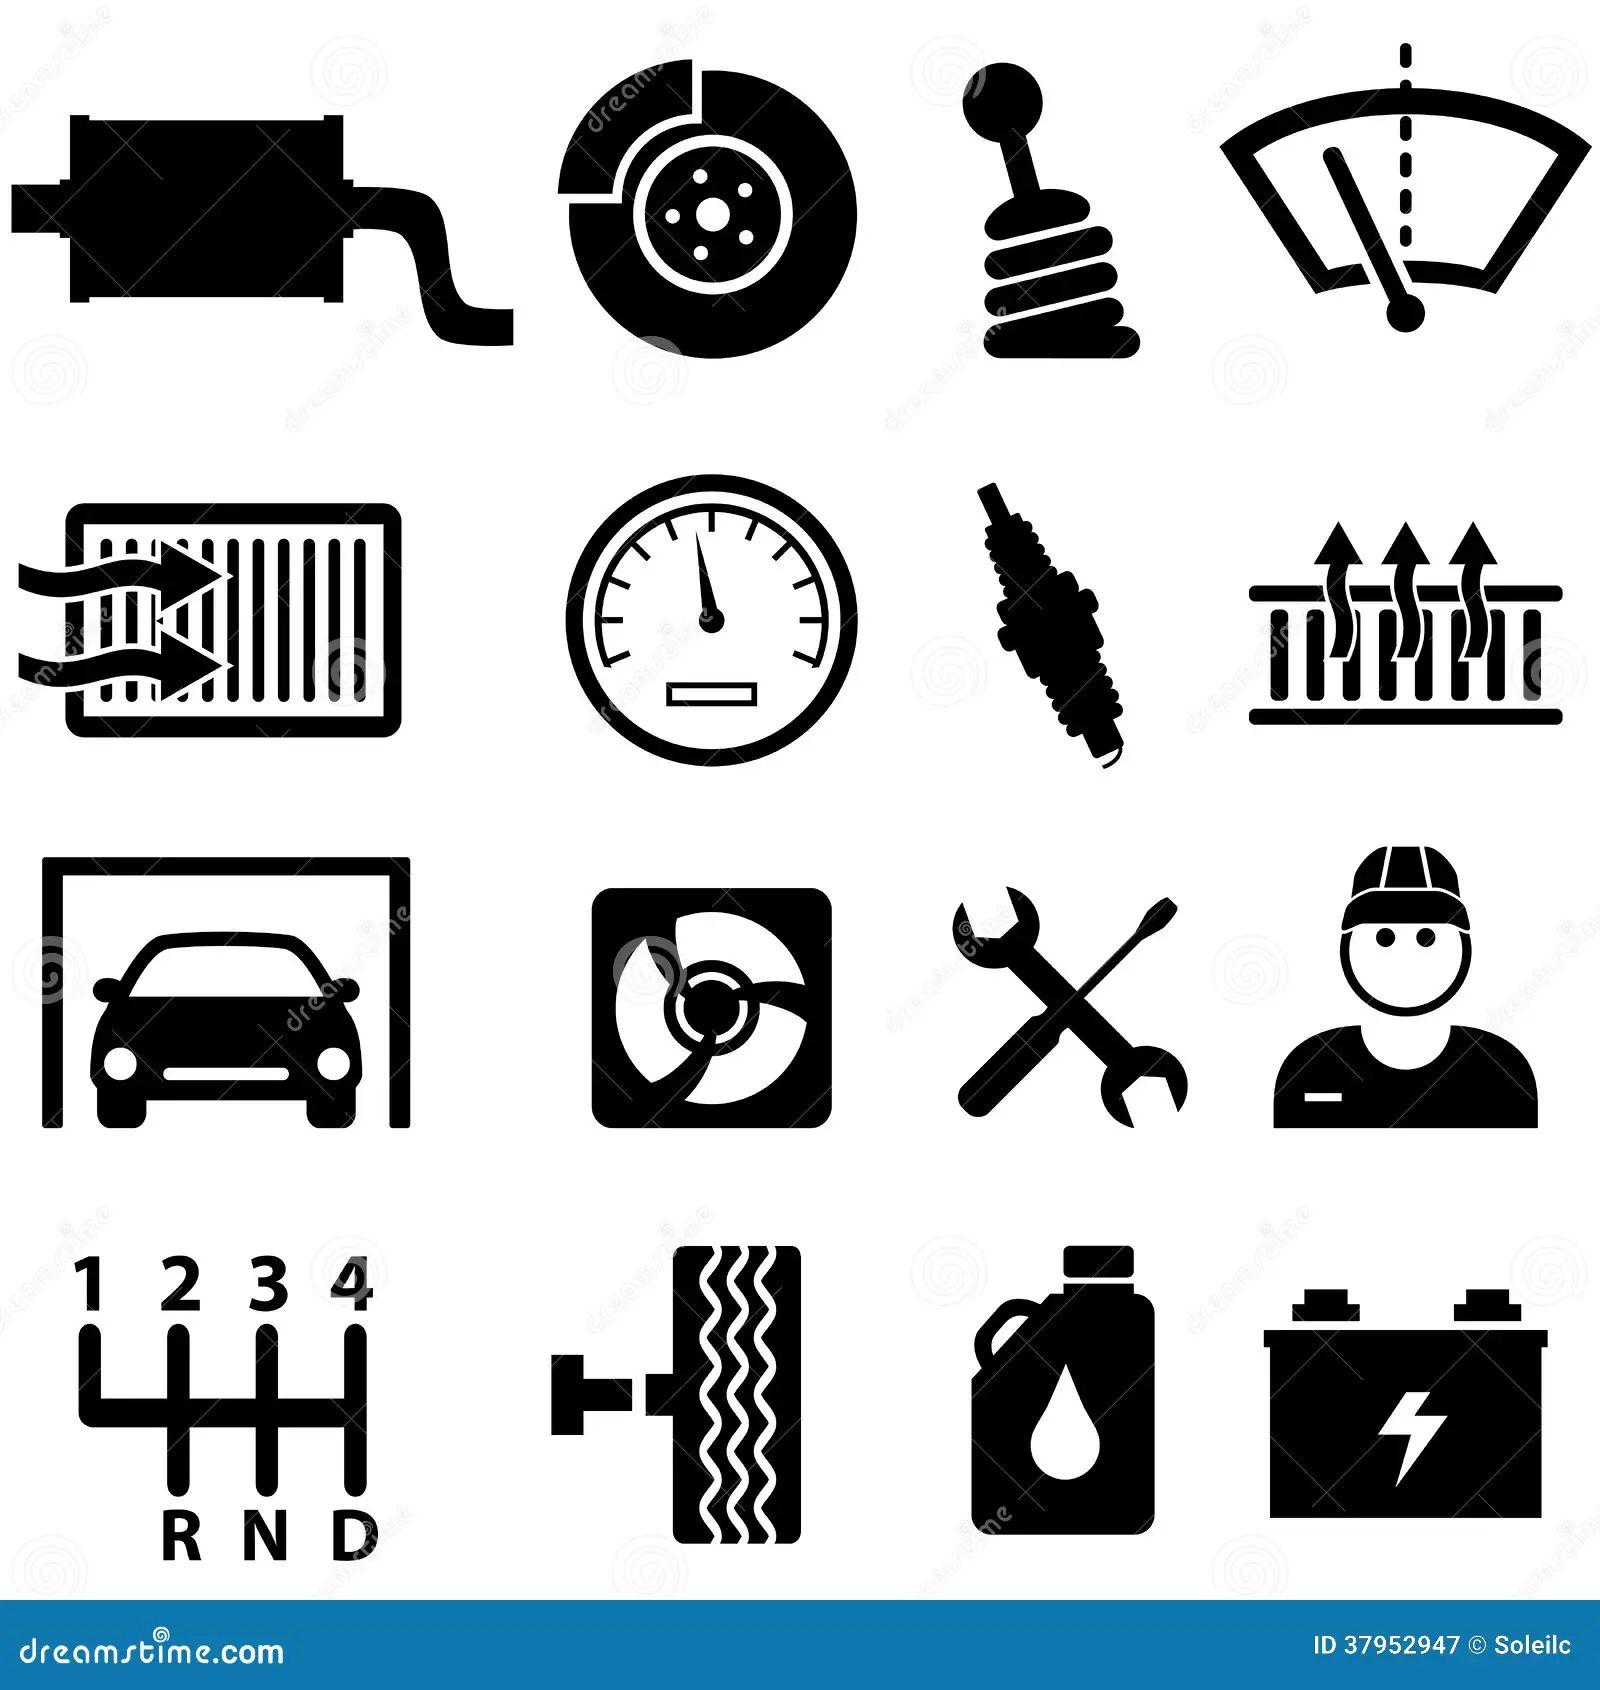 car fuse box icons